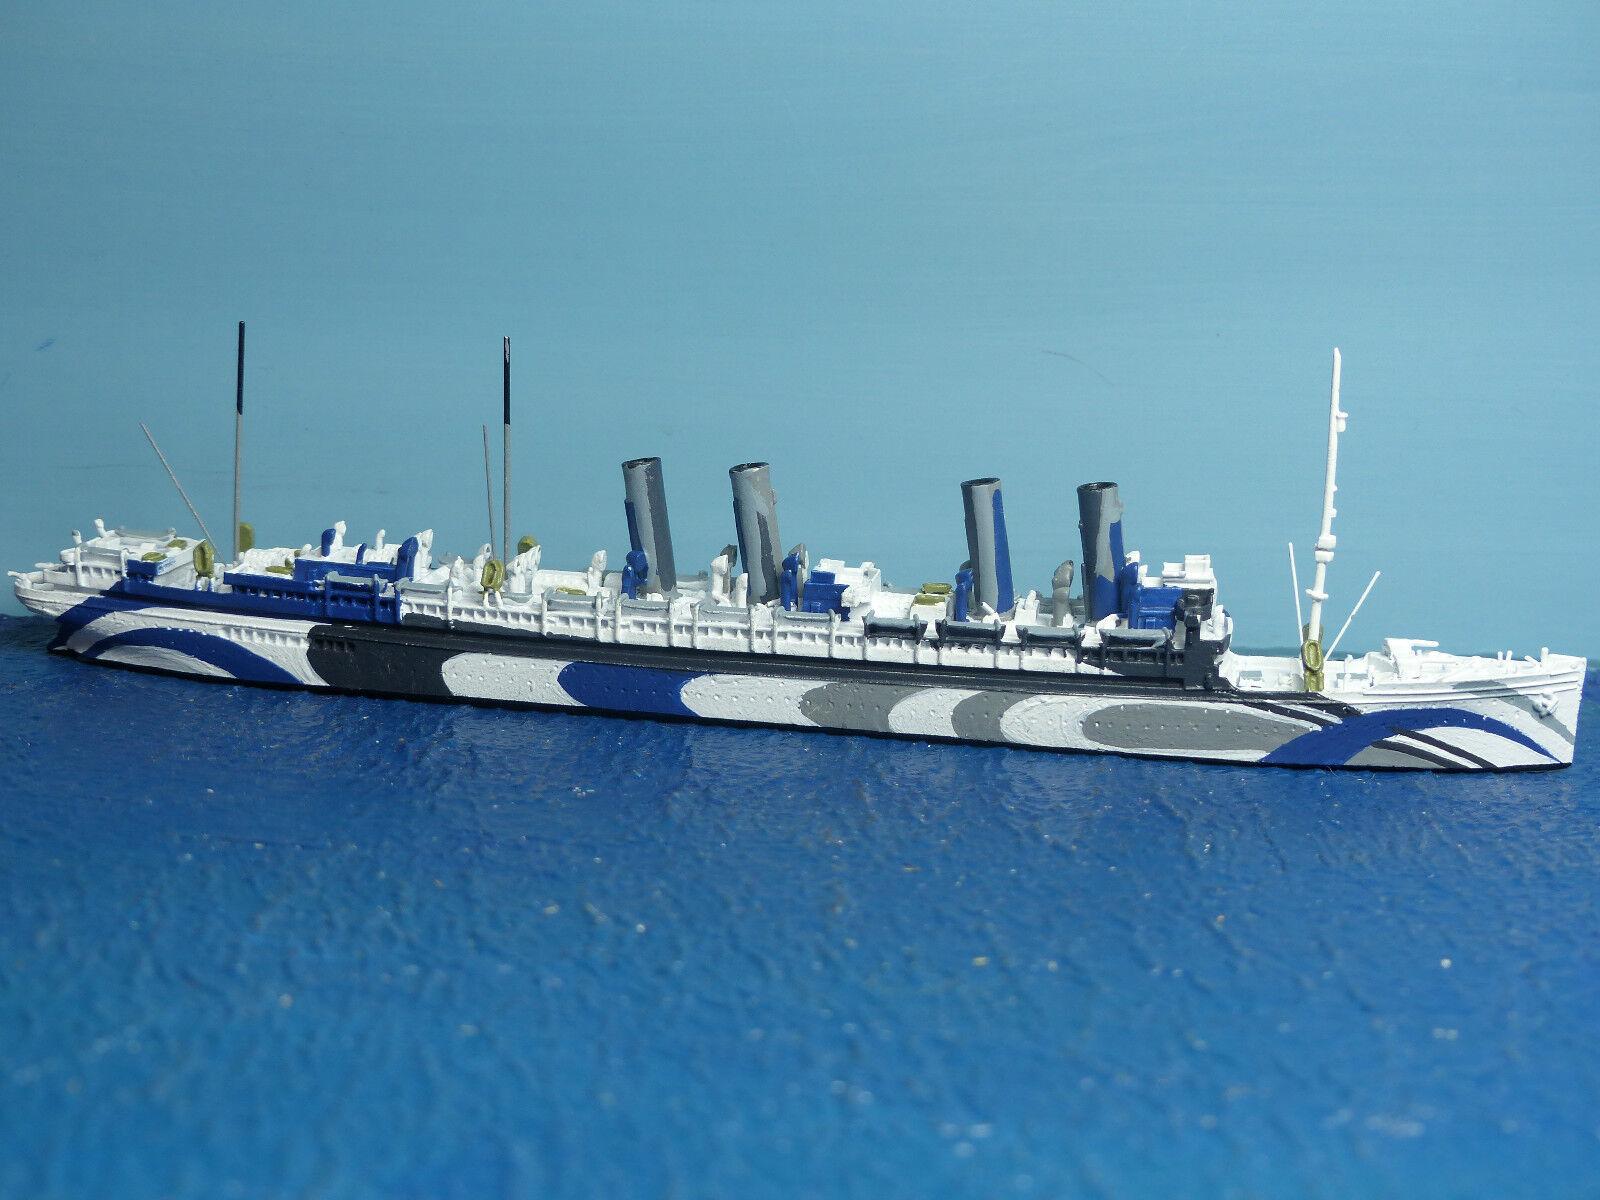 Cm navire 1:1250 USA troupes Transporteur